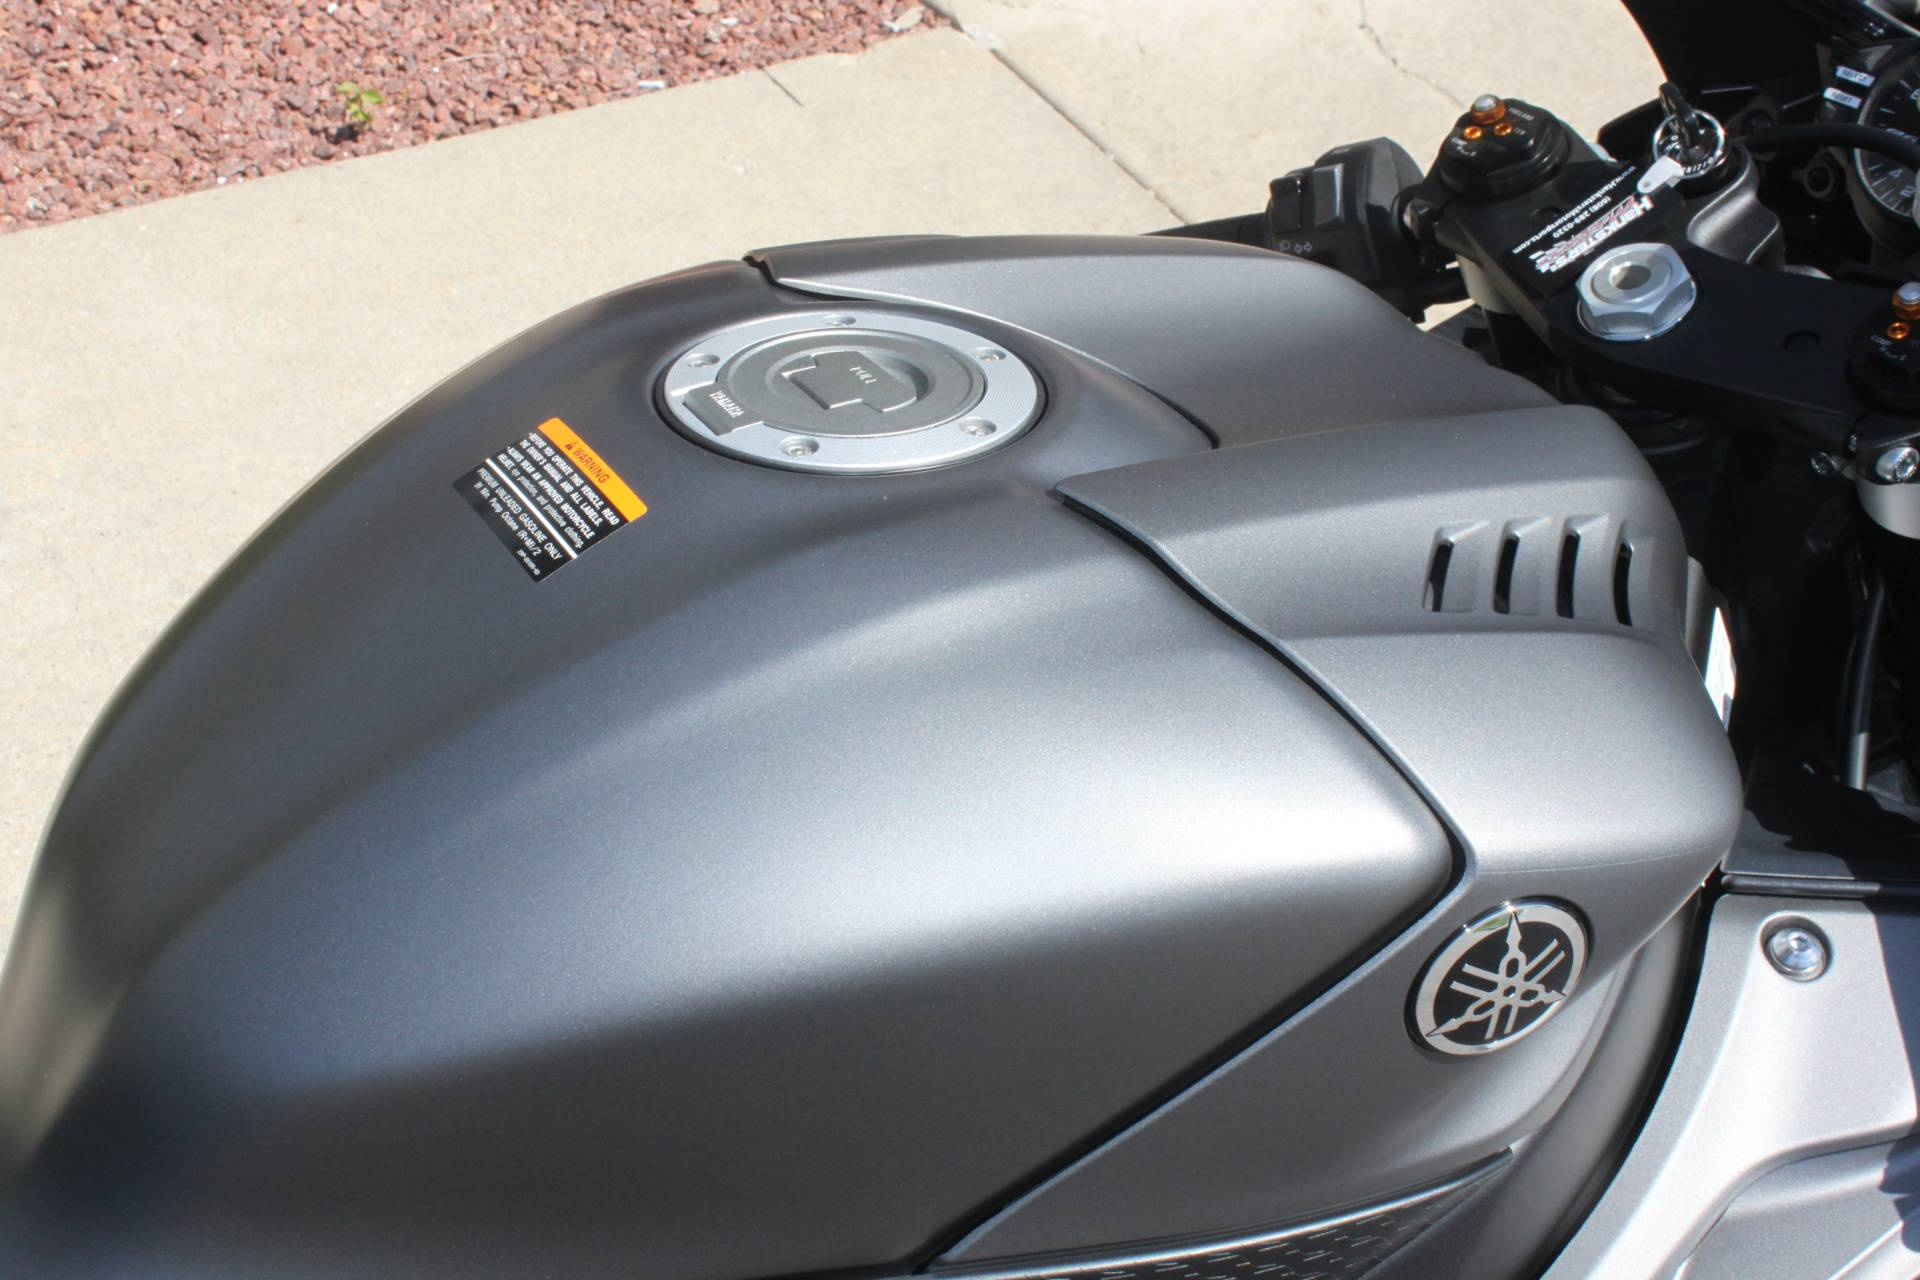 2018 Yamaha YZF-R6 9